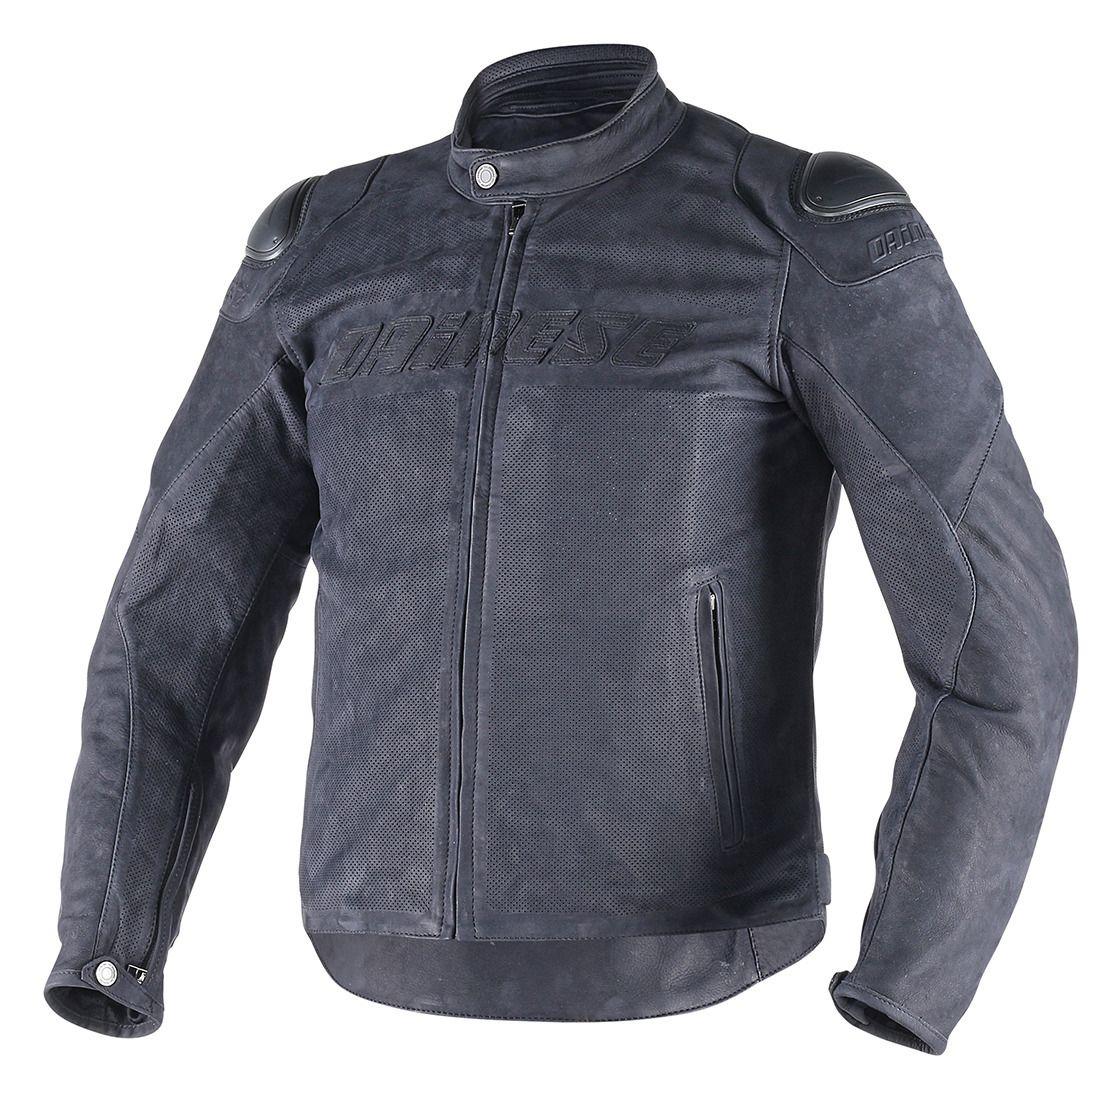 Leather jacket sale - Leather Jacket Sale 32